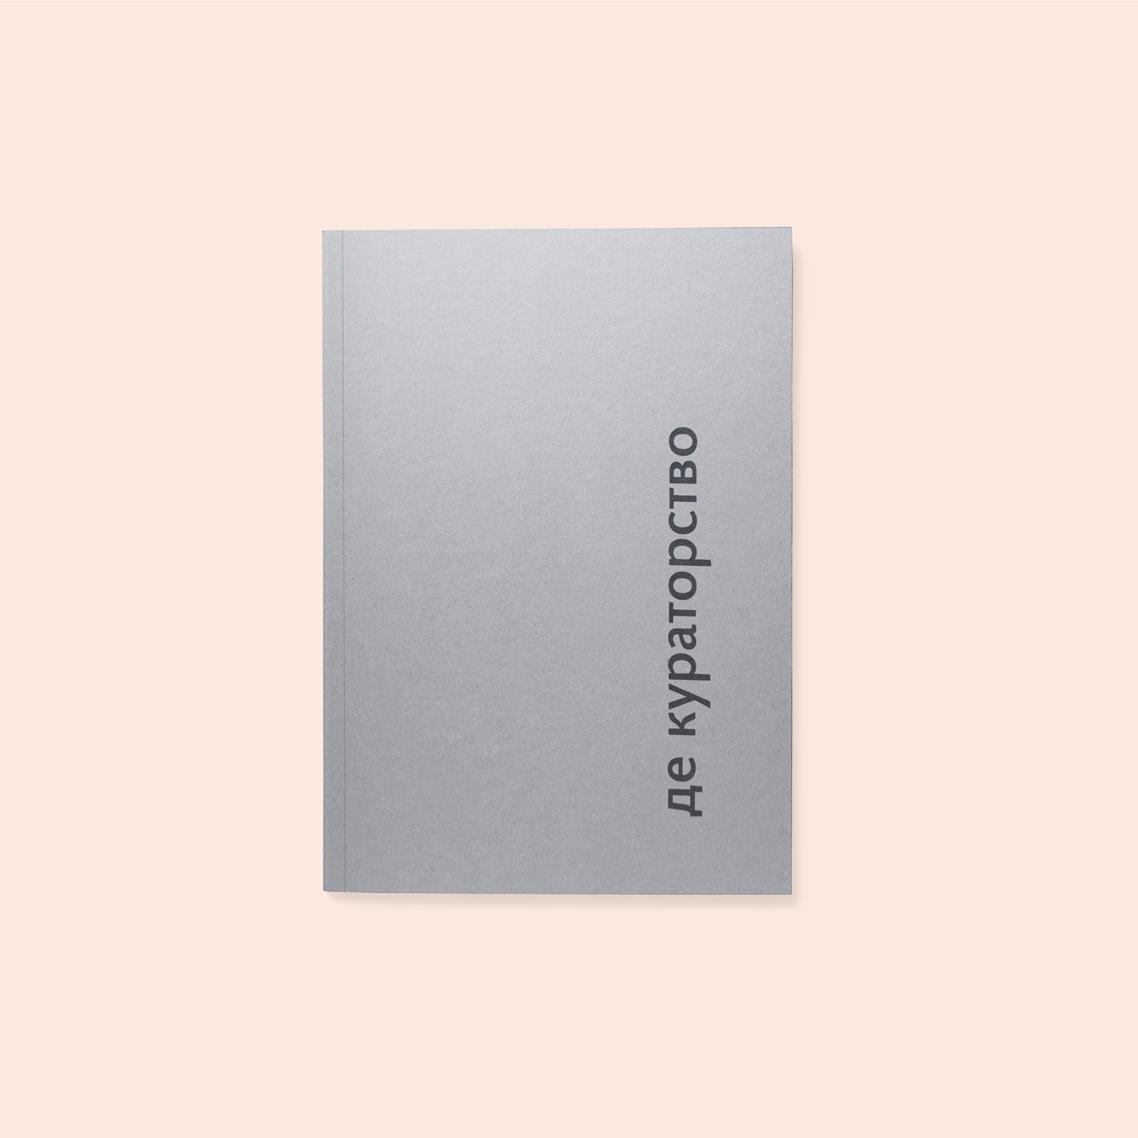 A5-Magazine-MockUp-square.png